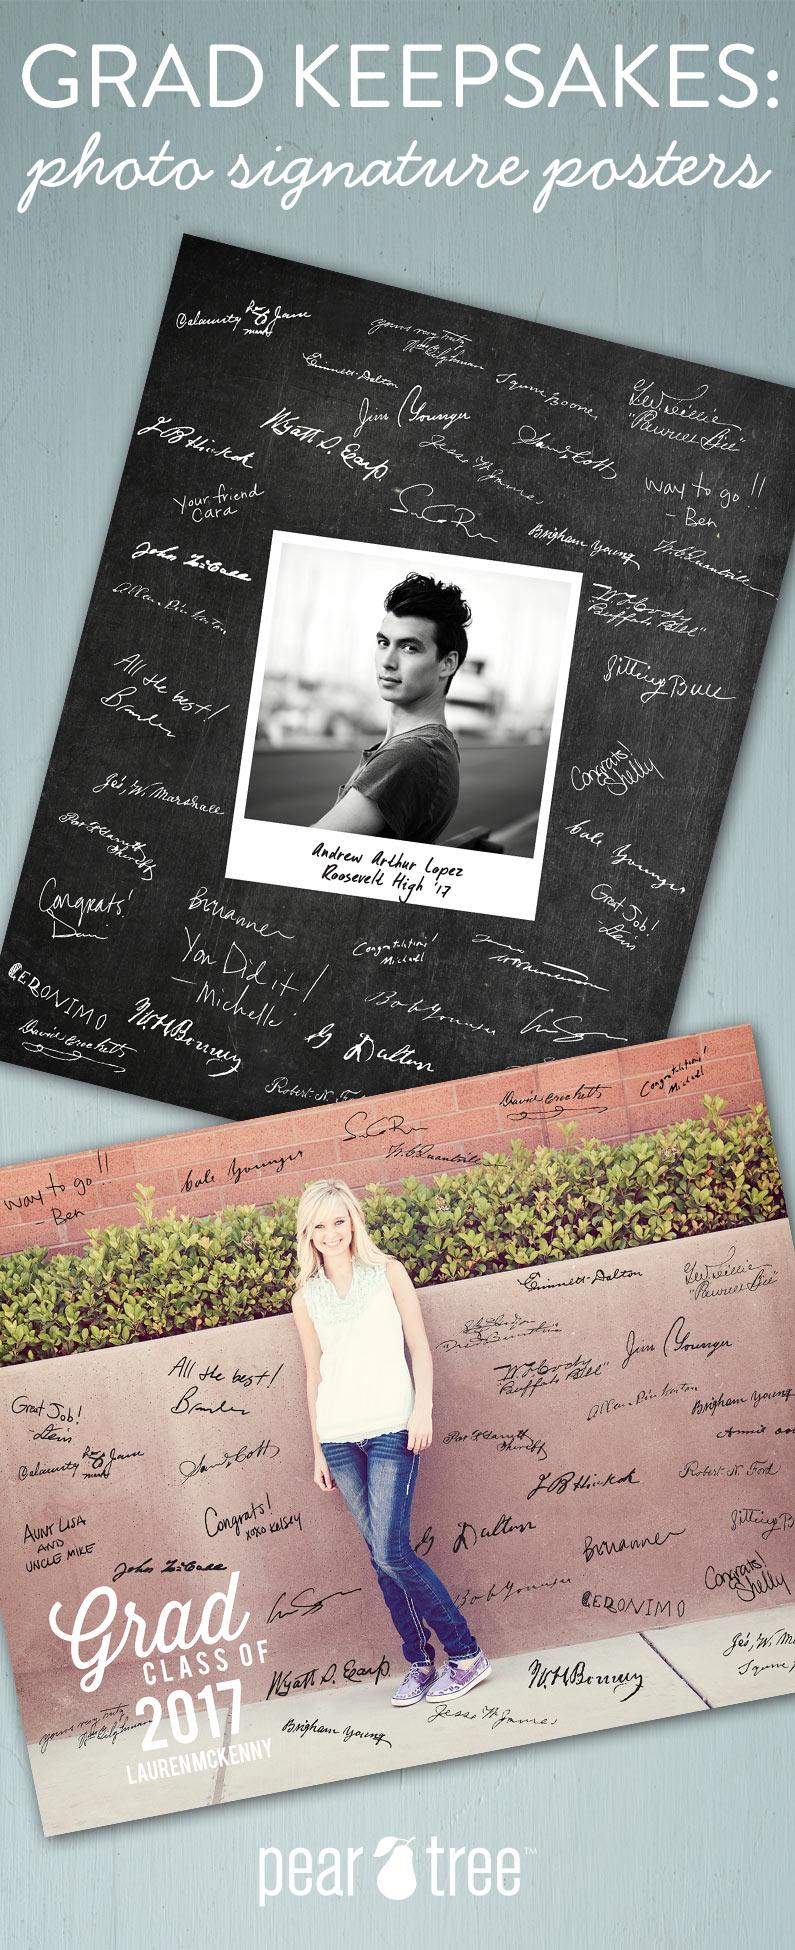 Graduation Keepsakes Made Easy: Photo Signature Posters